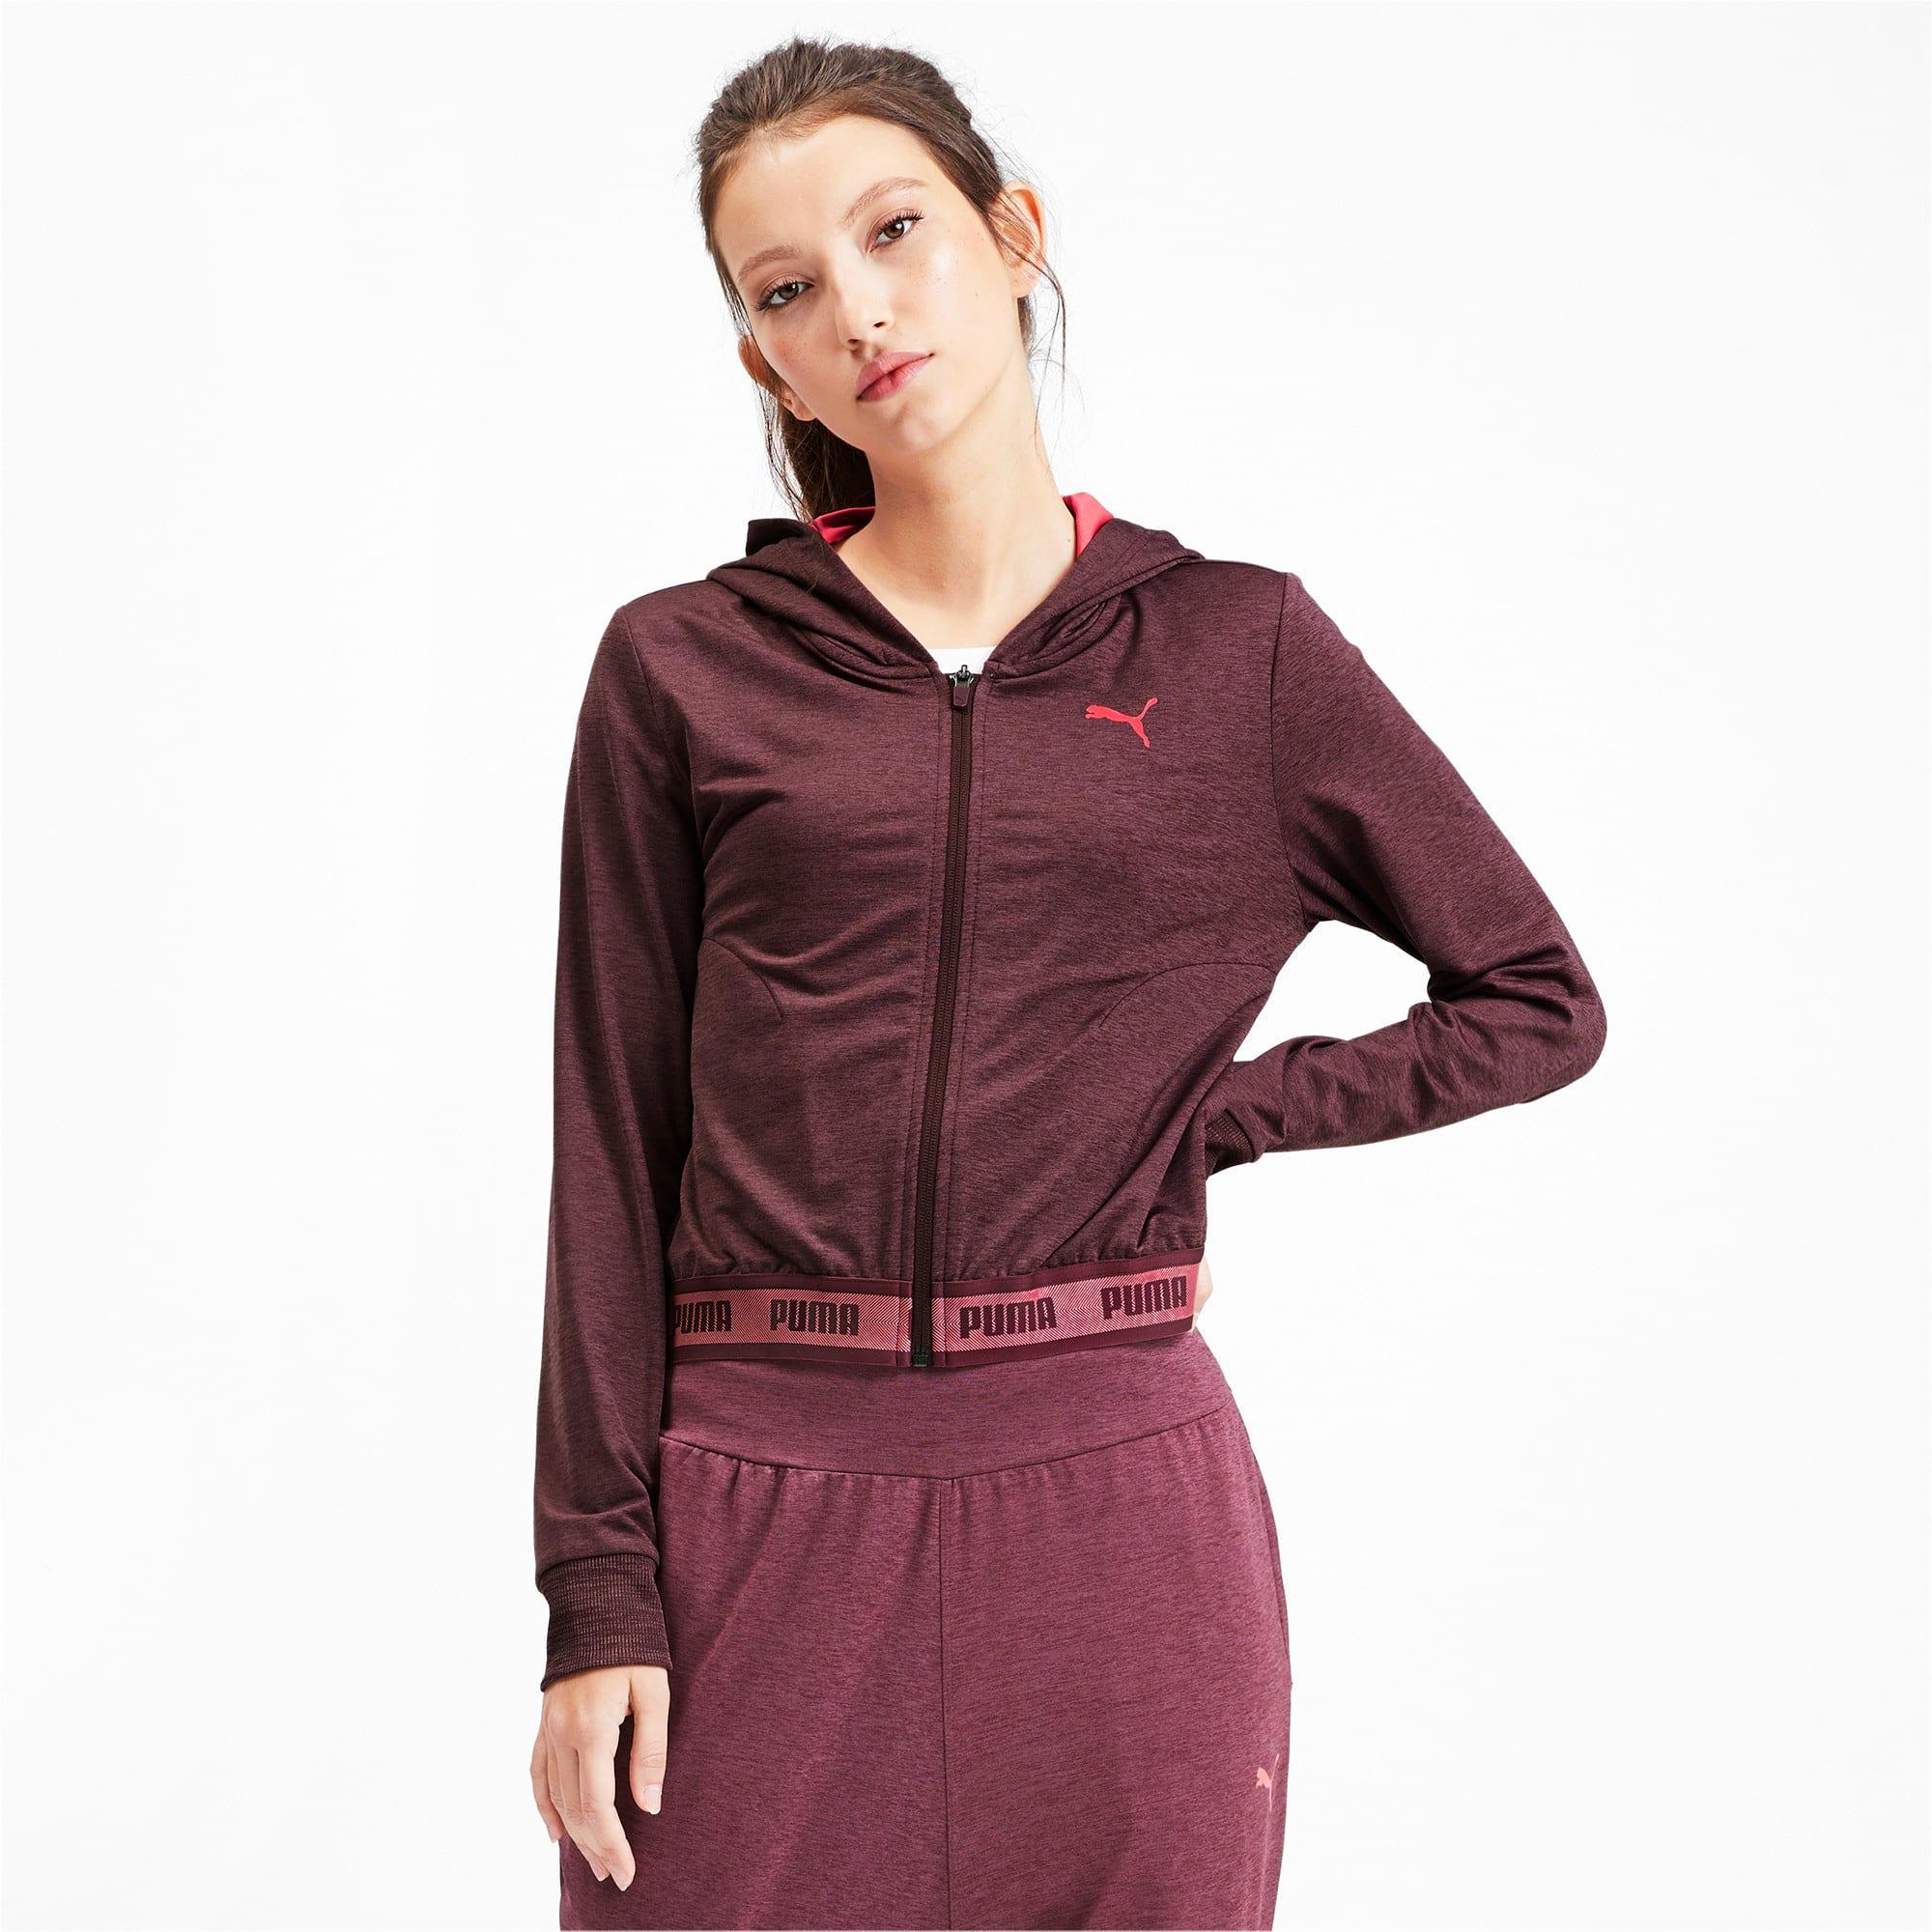 Thumbnail 1 of SOFT SPORTS Hooded Women's Sweat Jacket, Vineyard Wine Heather, medium-IND